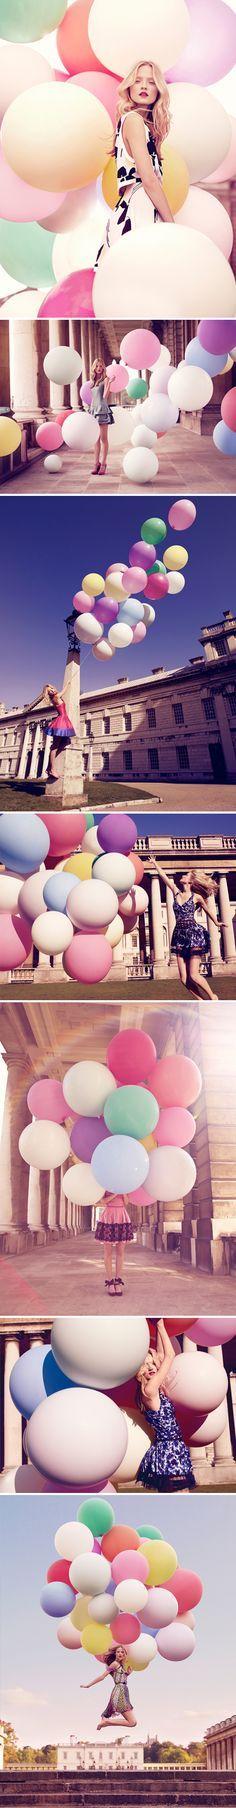 99 Luftballons   Zuckermonarchie Blog